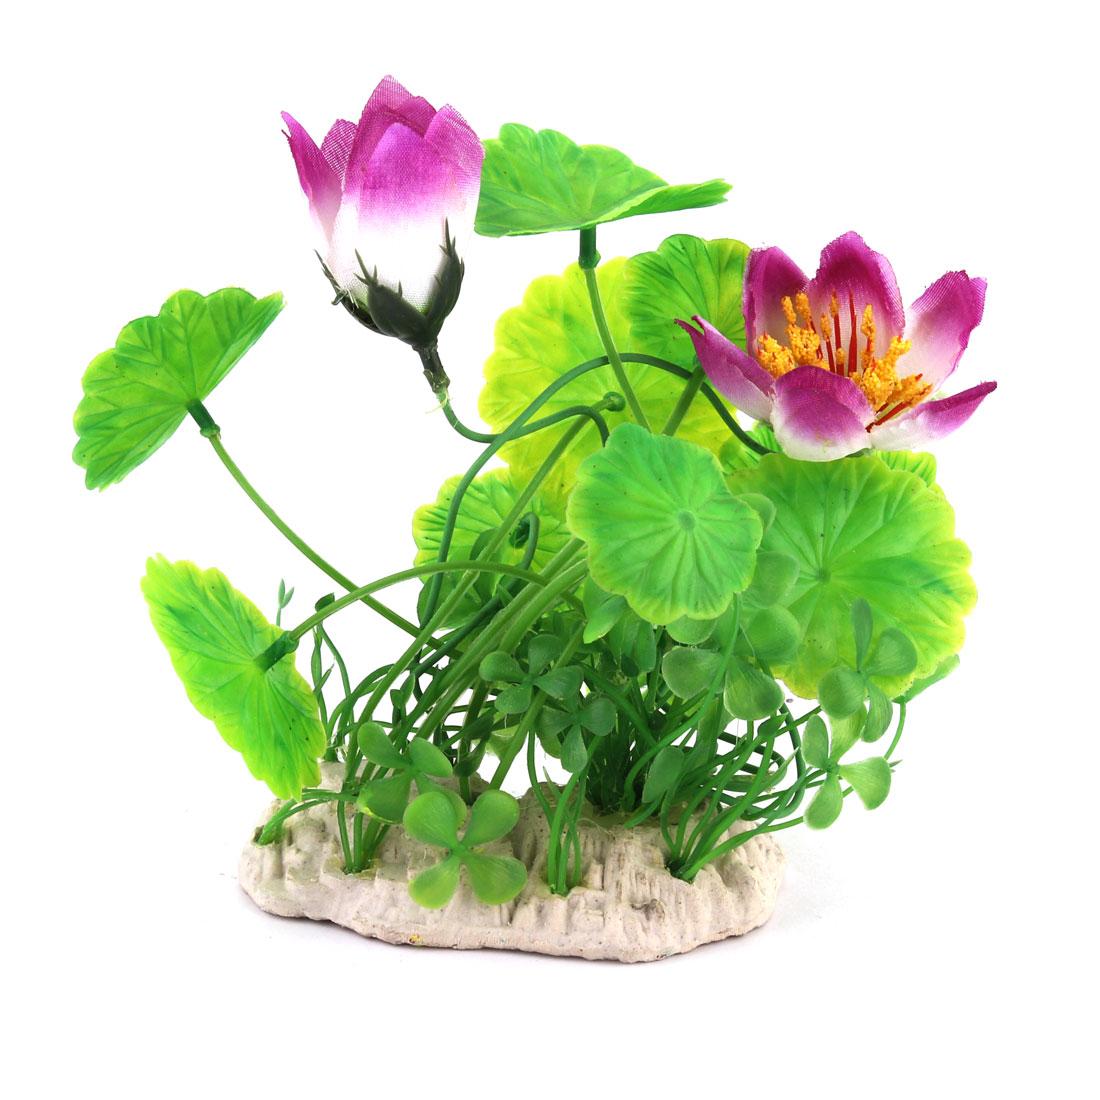 Aquarium Fishbowl Lotus Leaf Shape Emulation Water Plant Ornament Green Purple